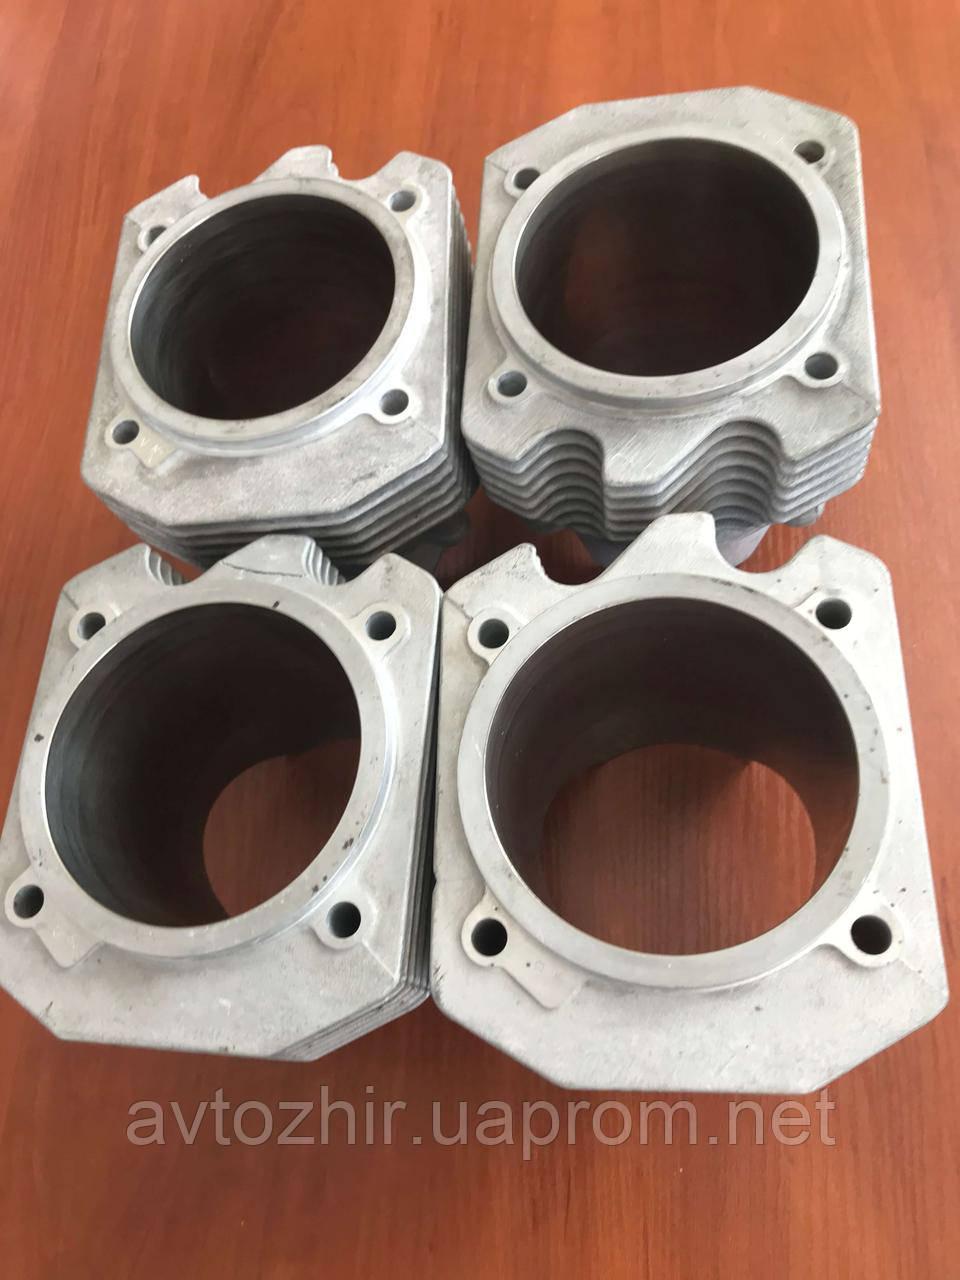 Цилиндр для двигателя Rotax 912 ULS (100л.с)